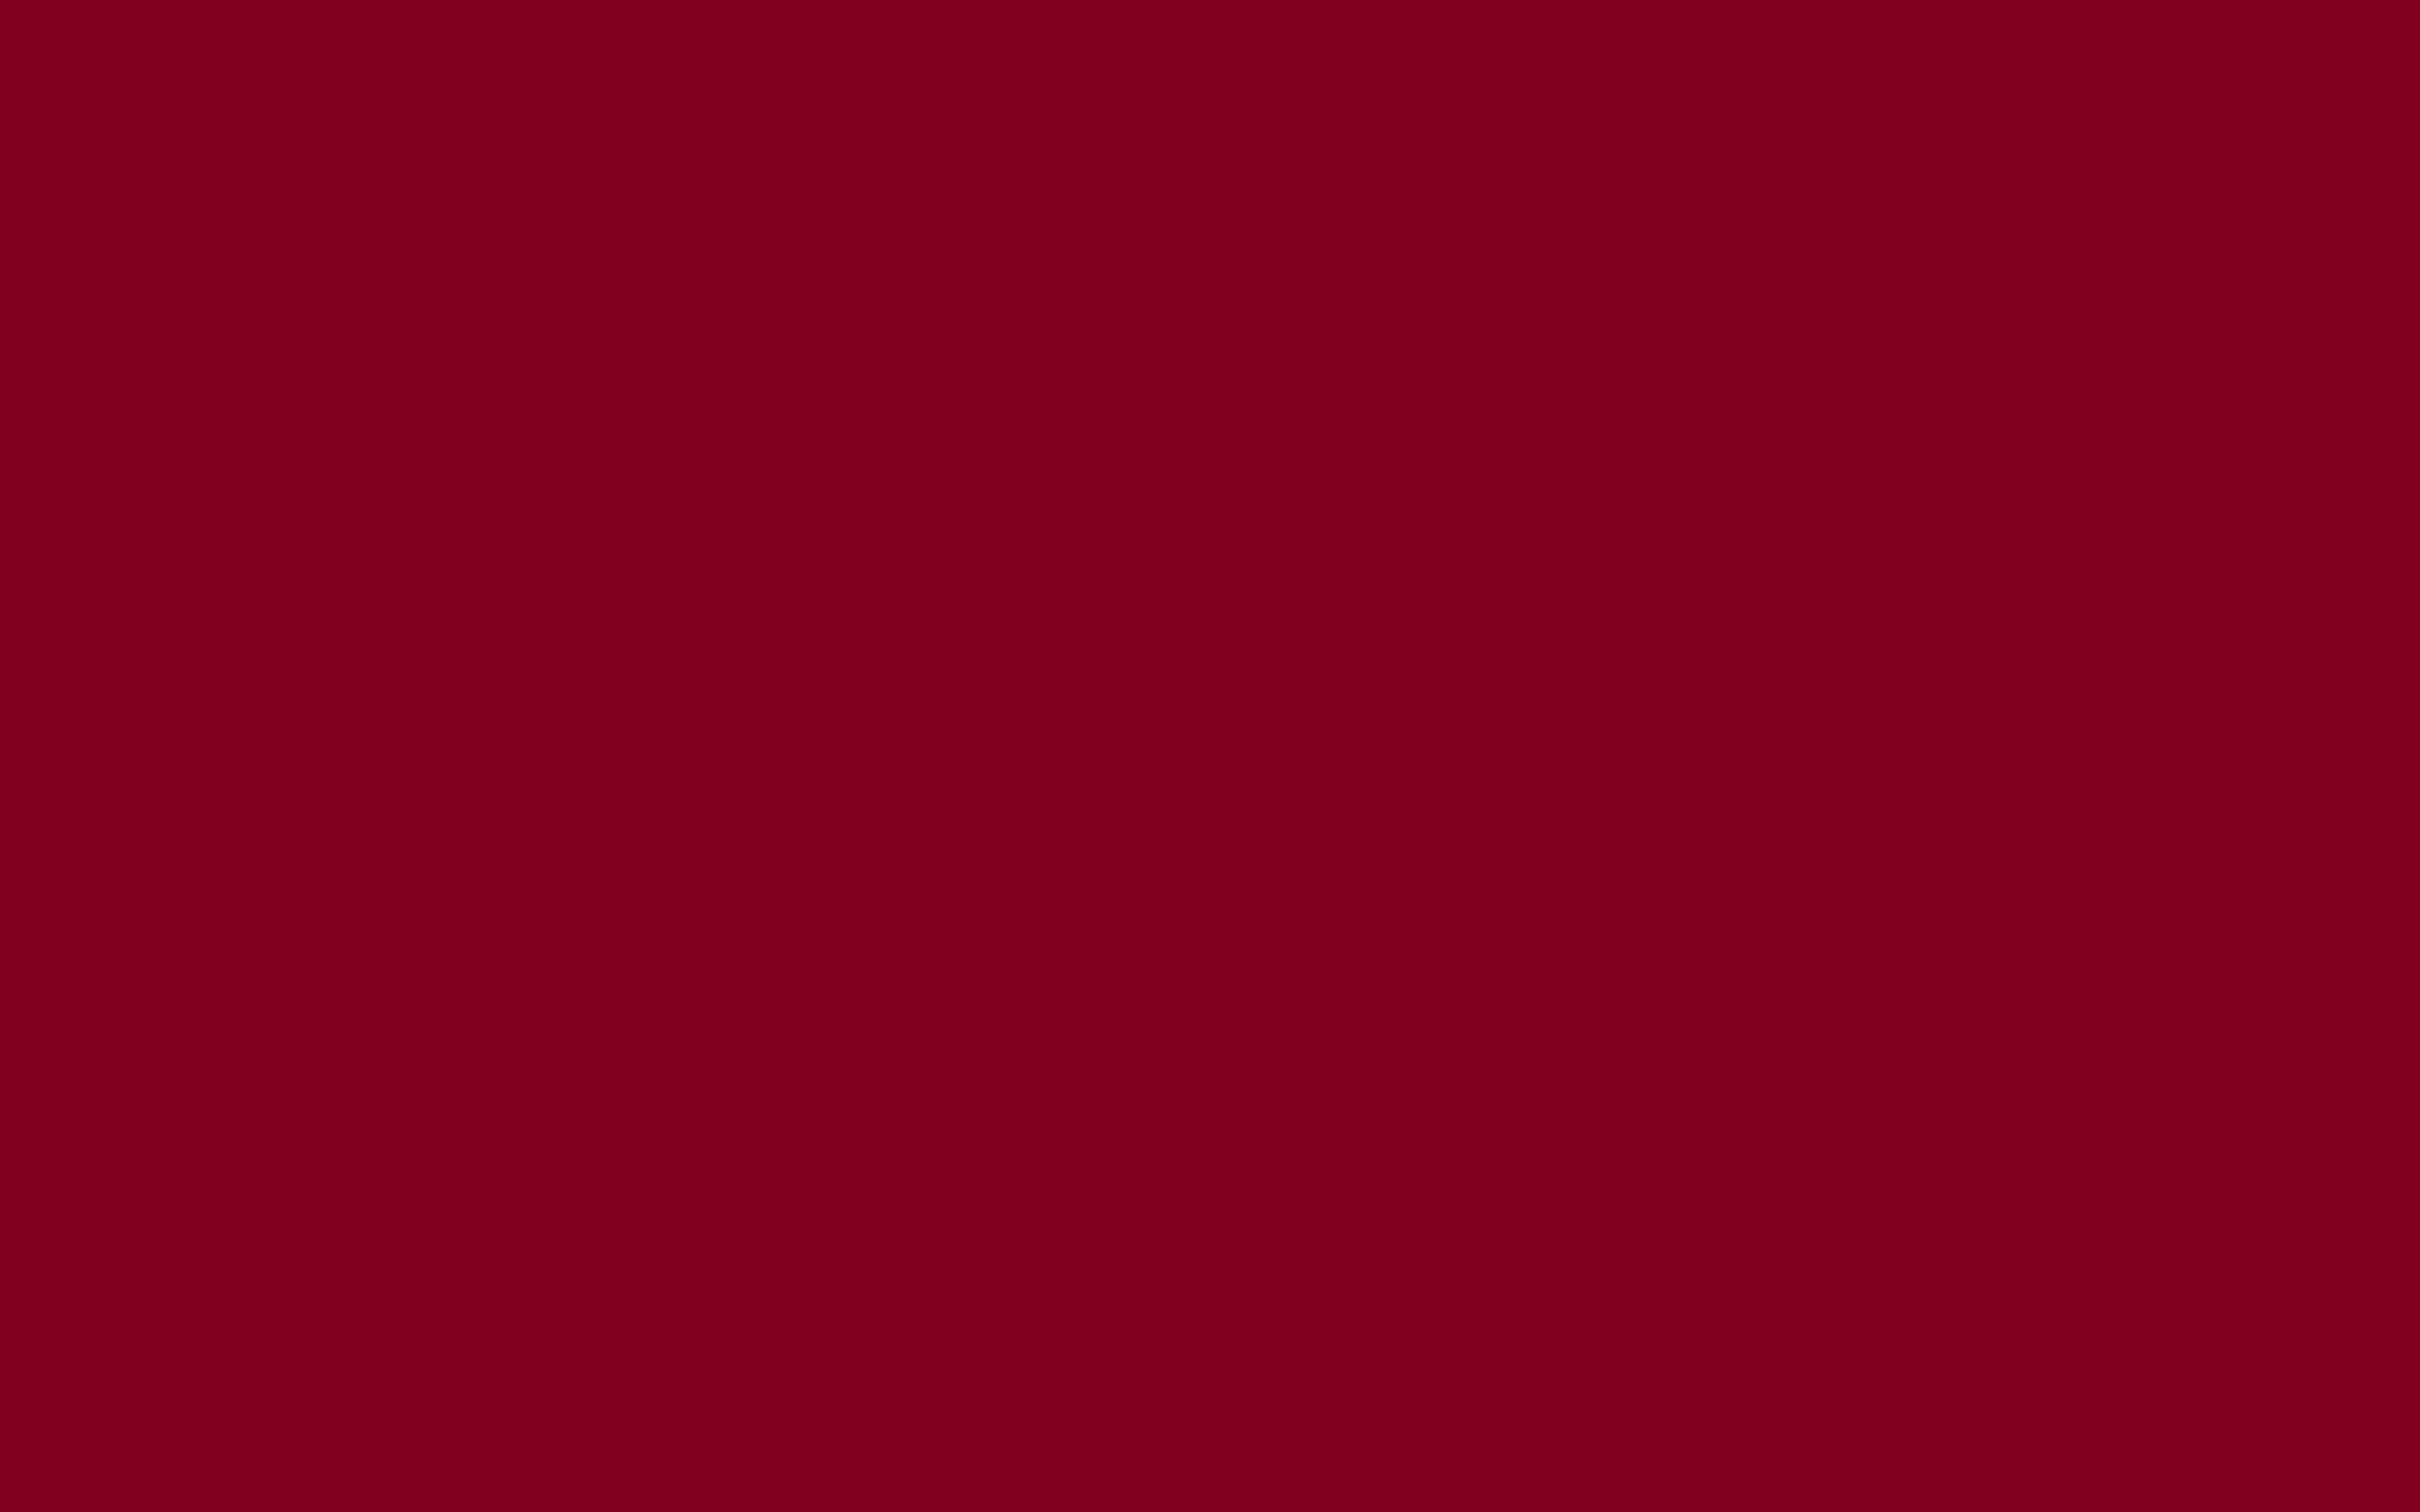 2560x1600 Burgundy Solid Color Background